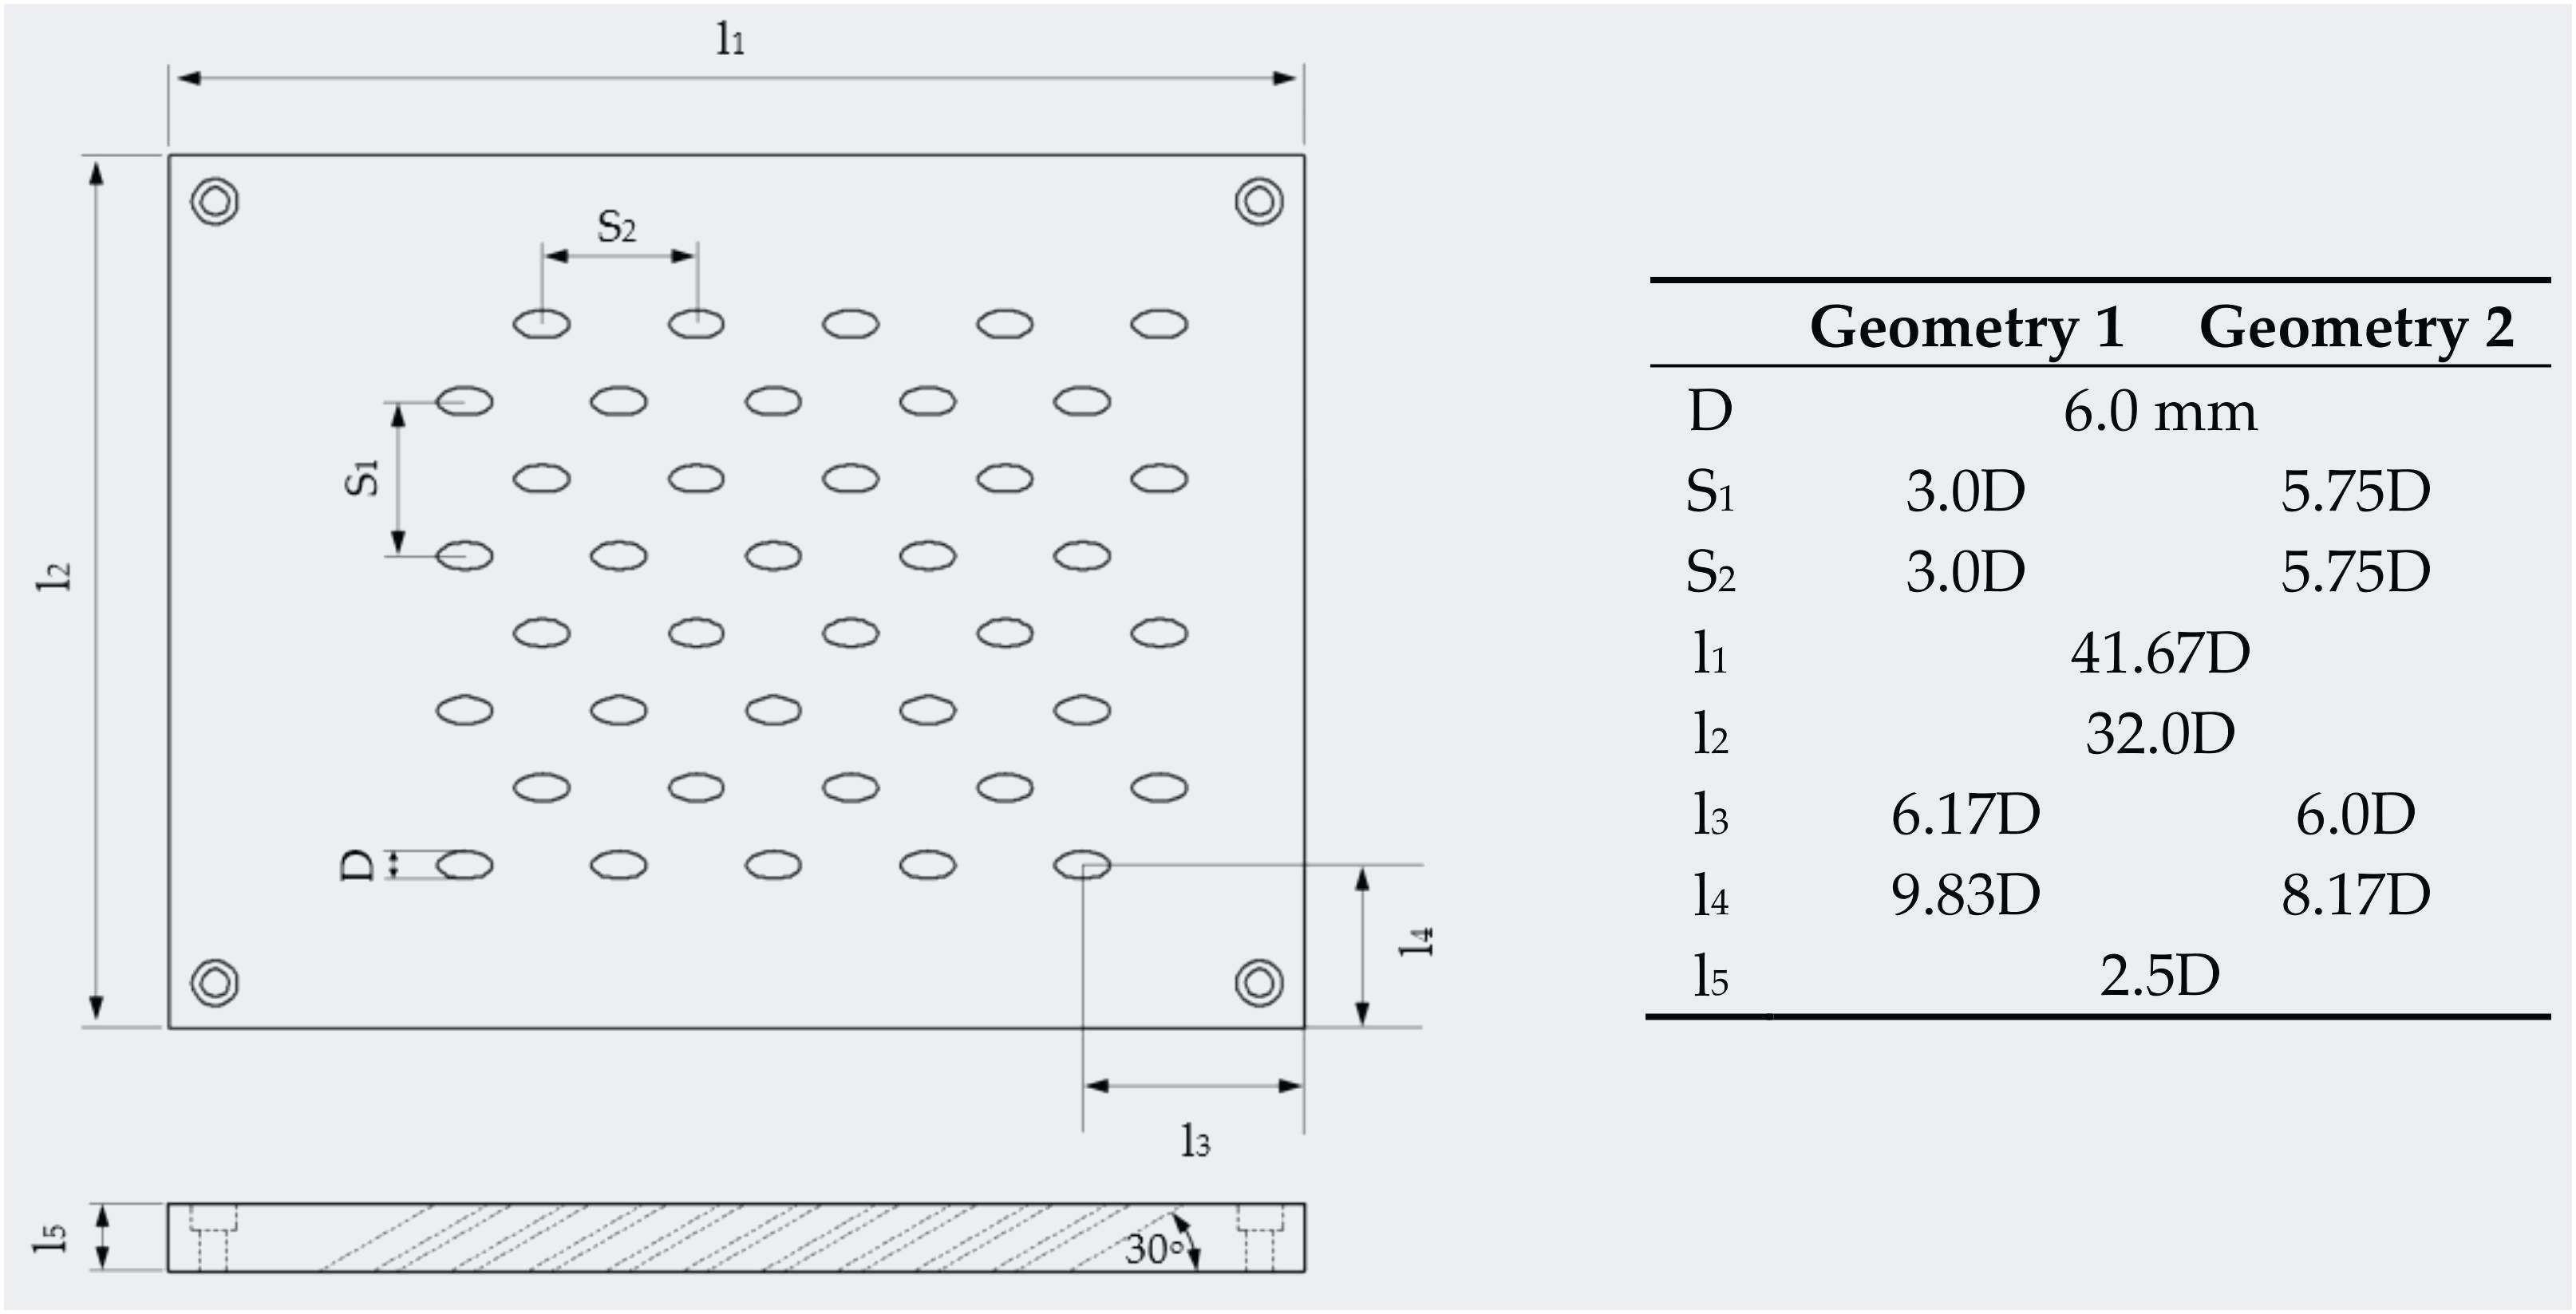 parts of a car engine diagram 30 honda xr100 parts – car parts list with of